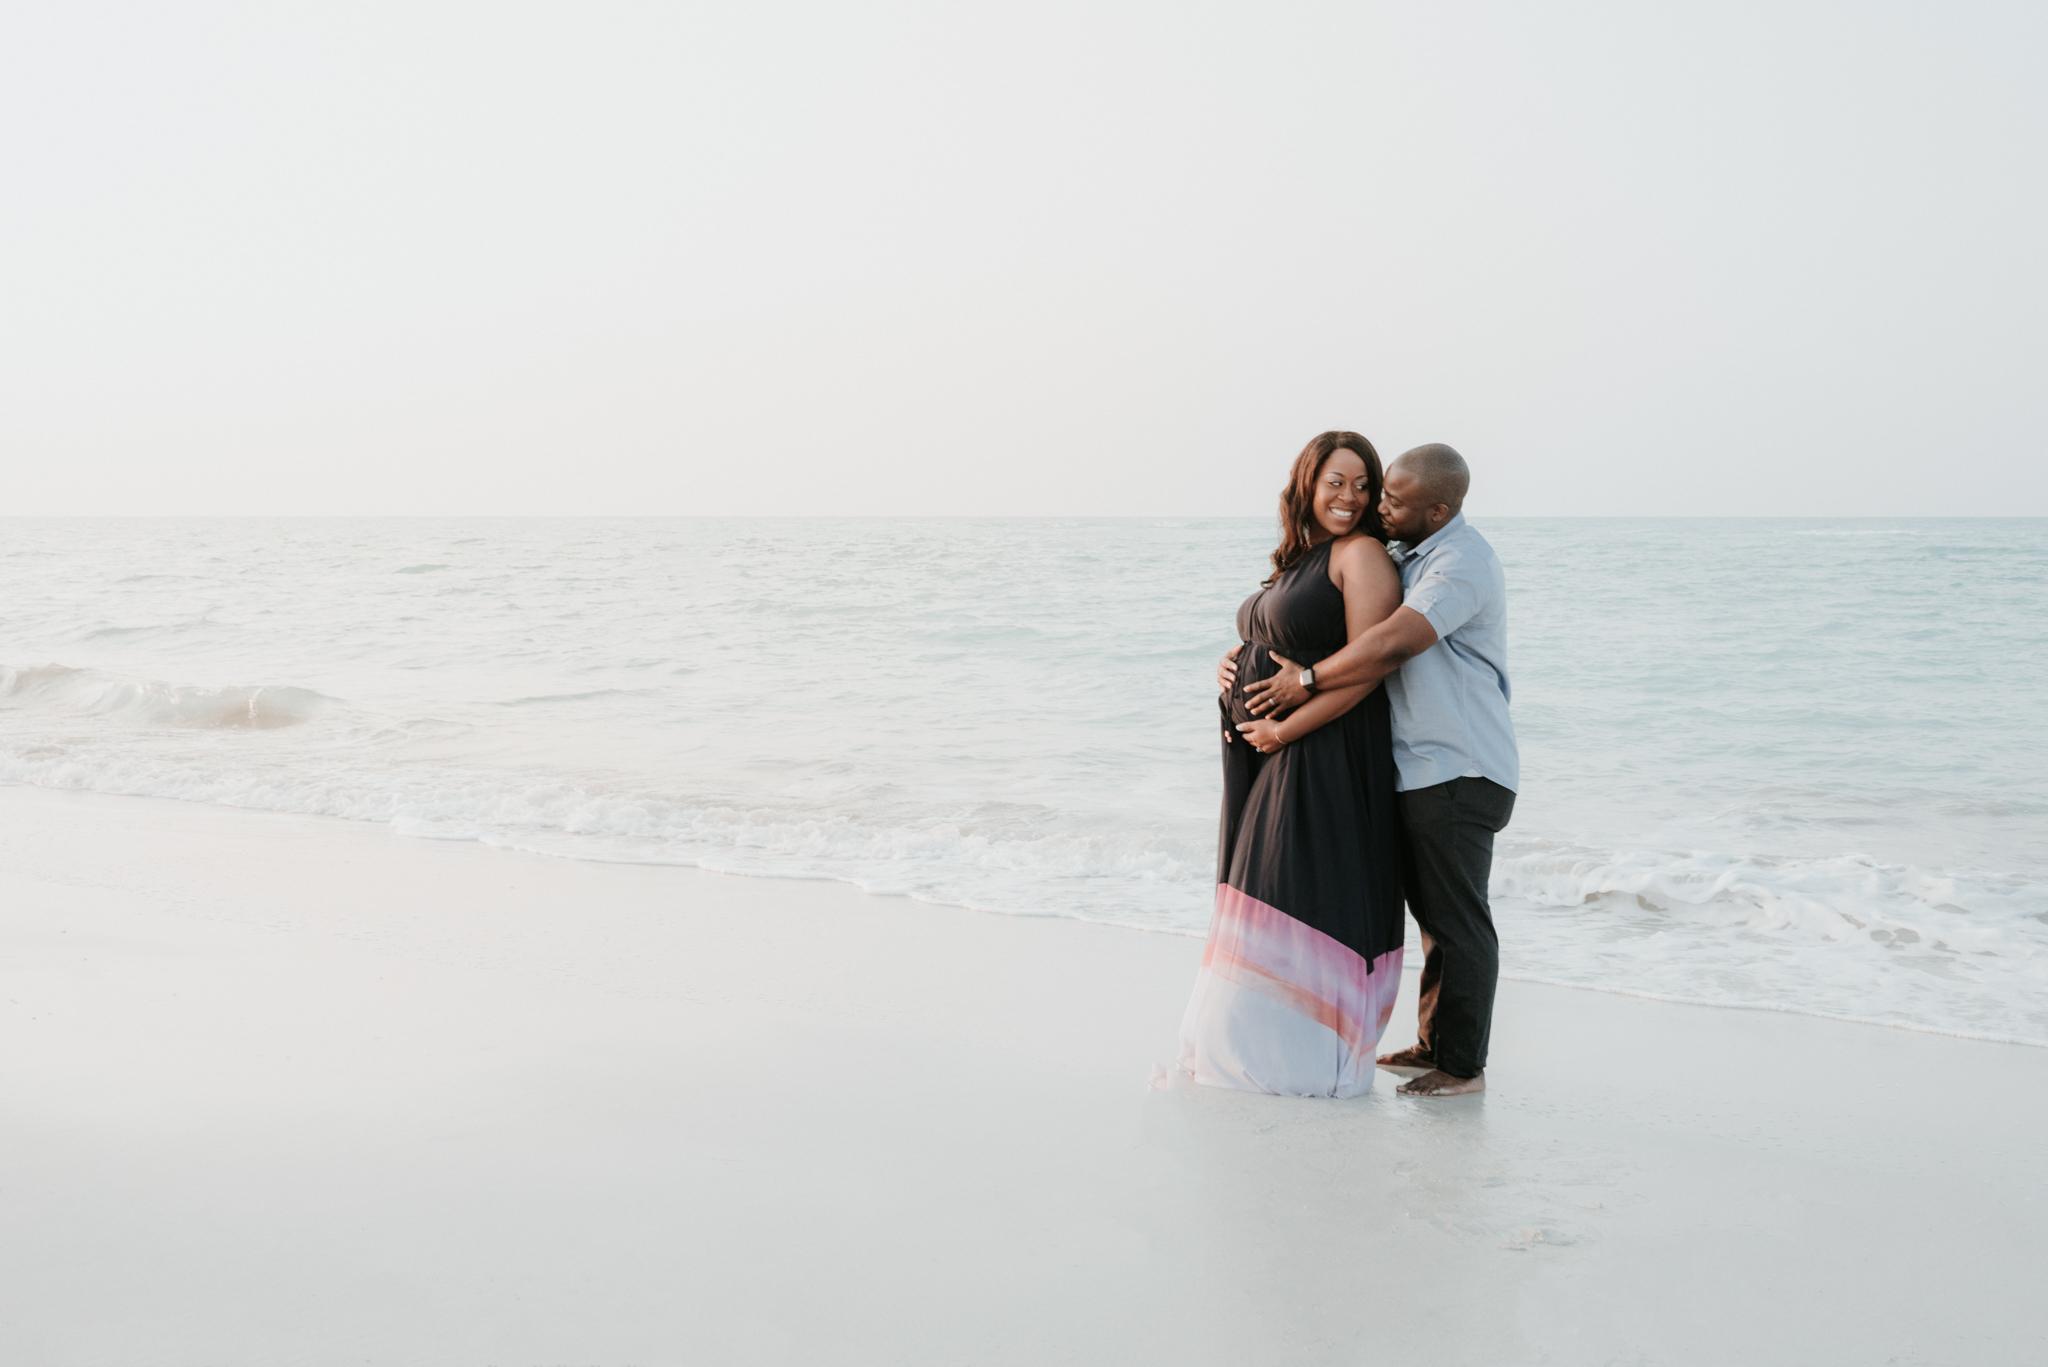 Lana-Photographs-Dubai-Maternity-Photographer-Kristina-PSLR-26.jpg